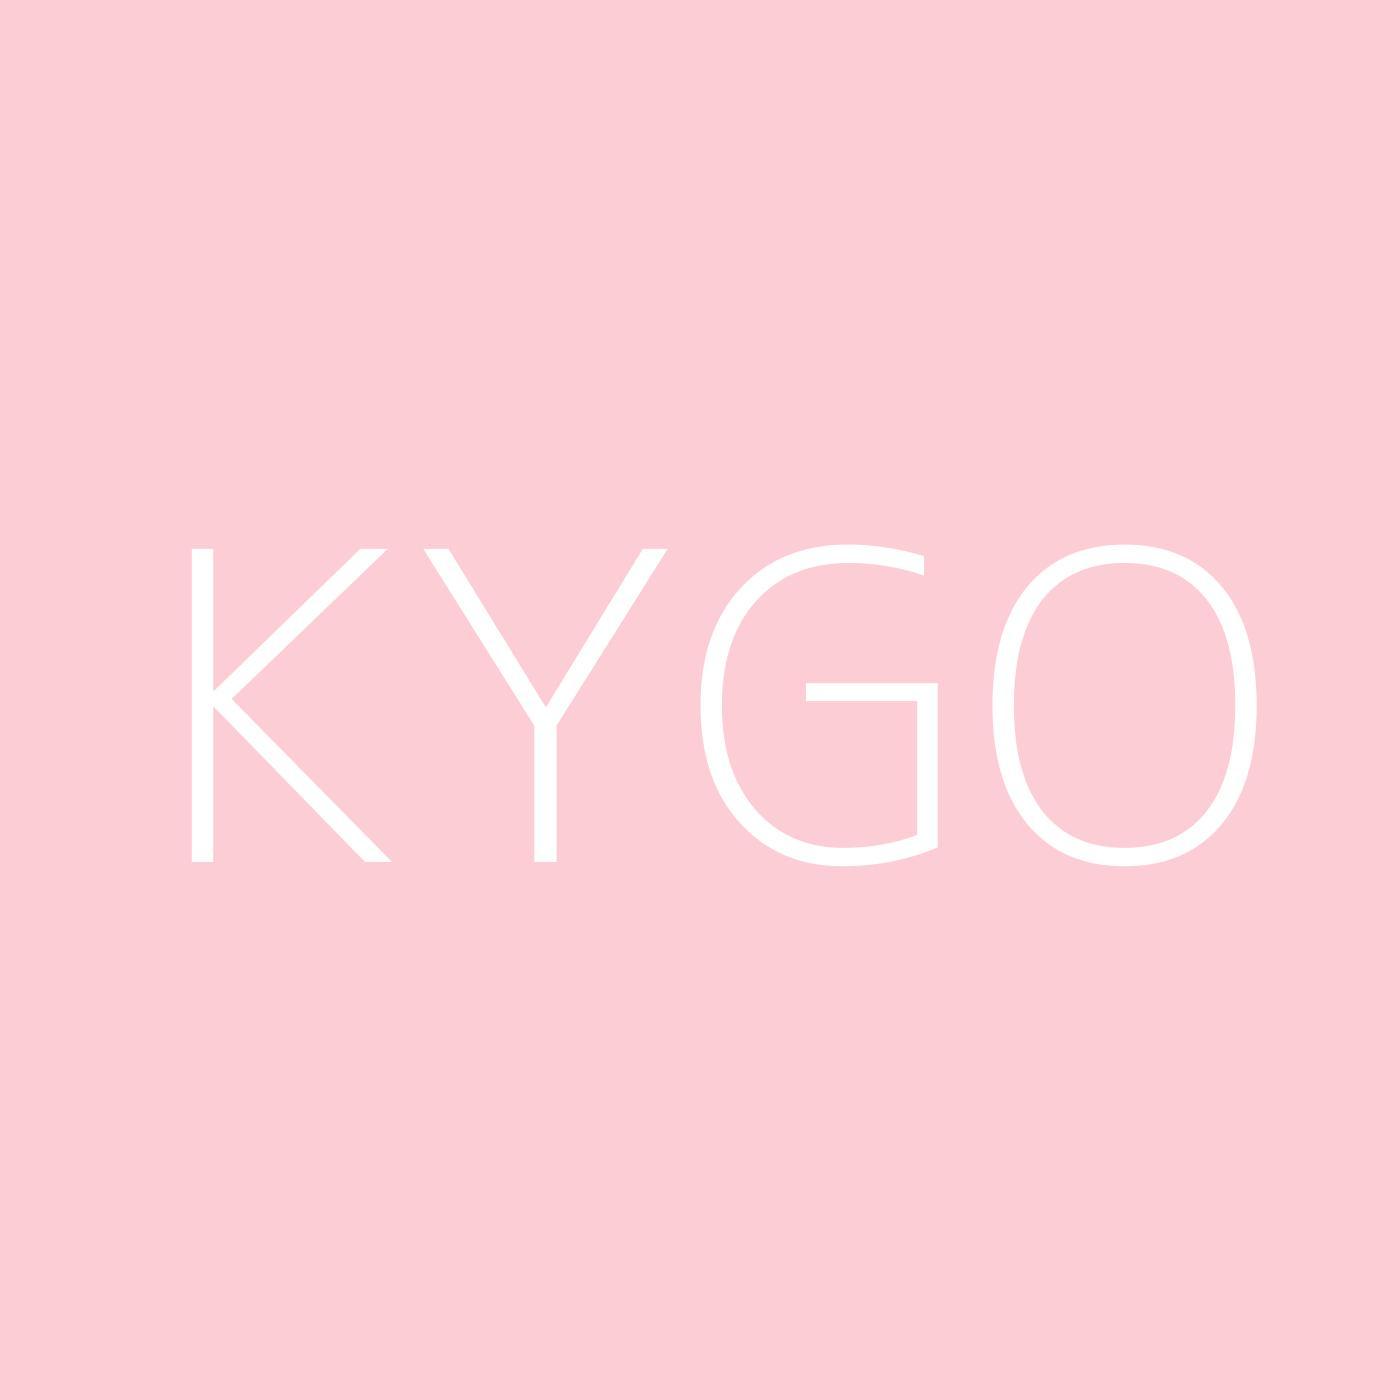 Kygo Playlist Artwork